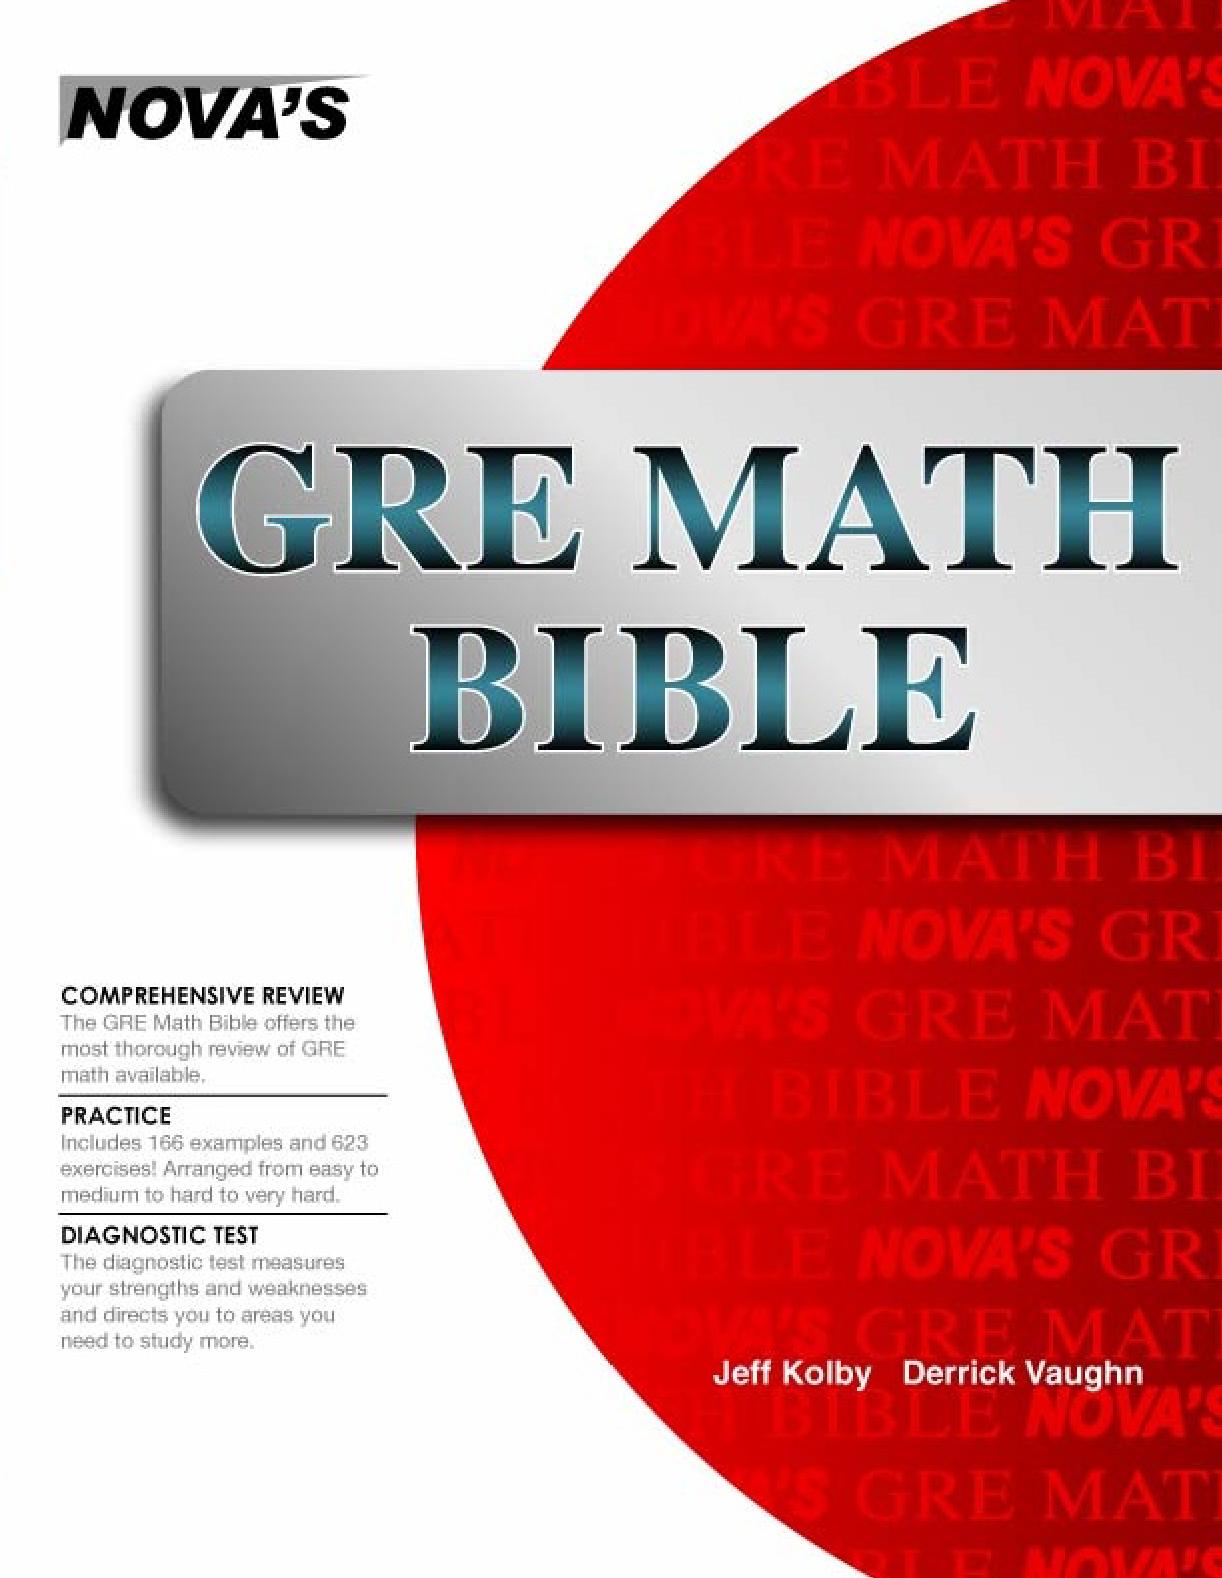 http://www.mediafire.com/view/u5qawrmz8j3kxh3/Nova_GRE_Math_Bible_.pdf